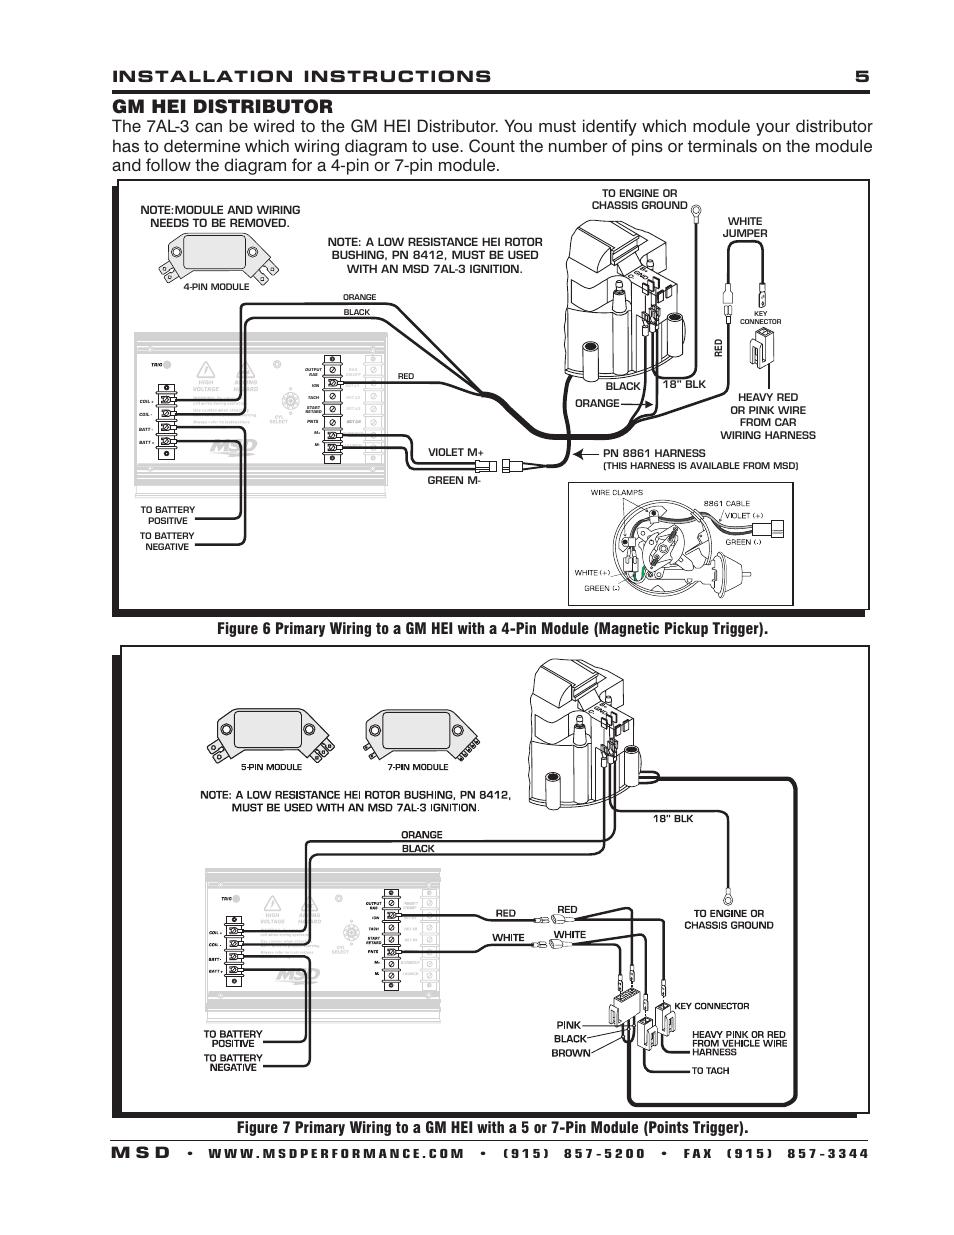 Msd Ignition 7al 3 Wiring Diagram - Wiring Data